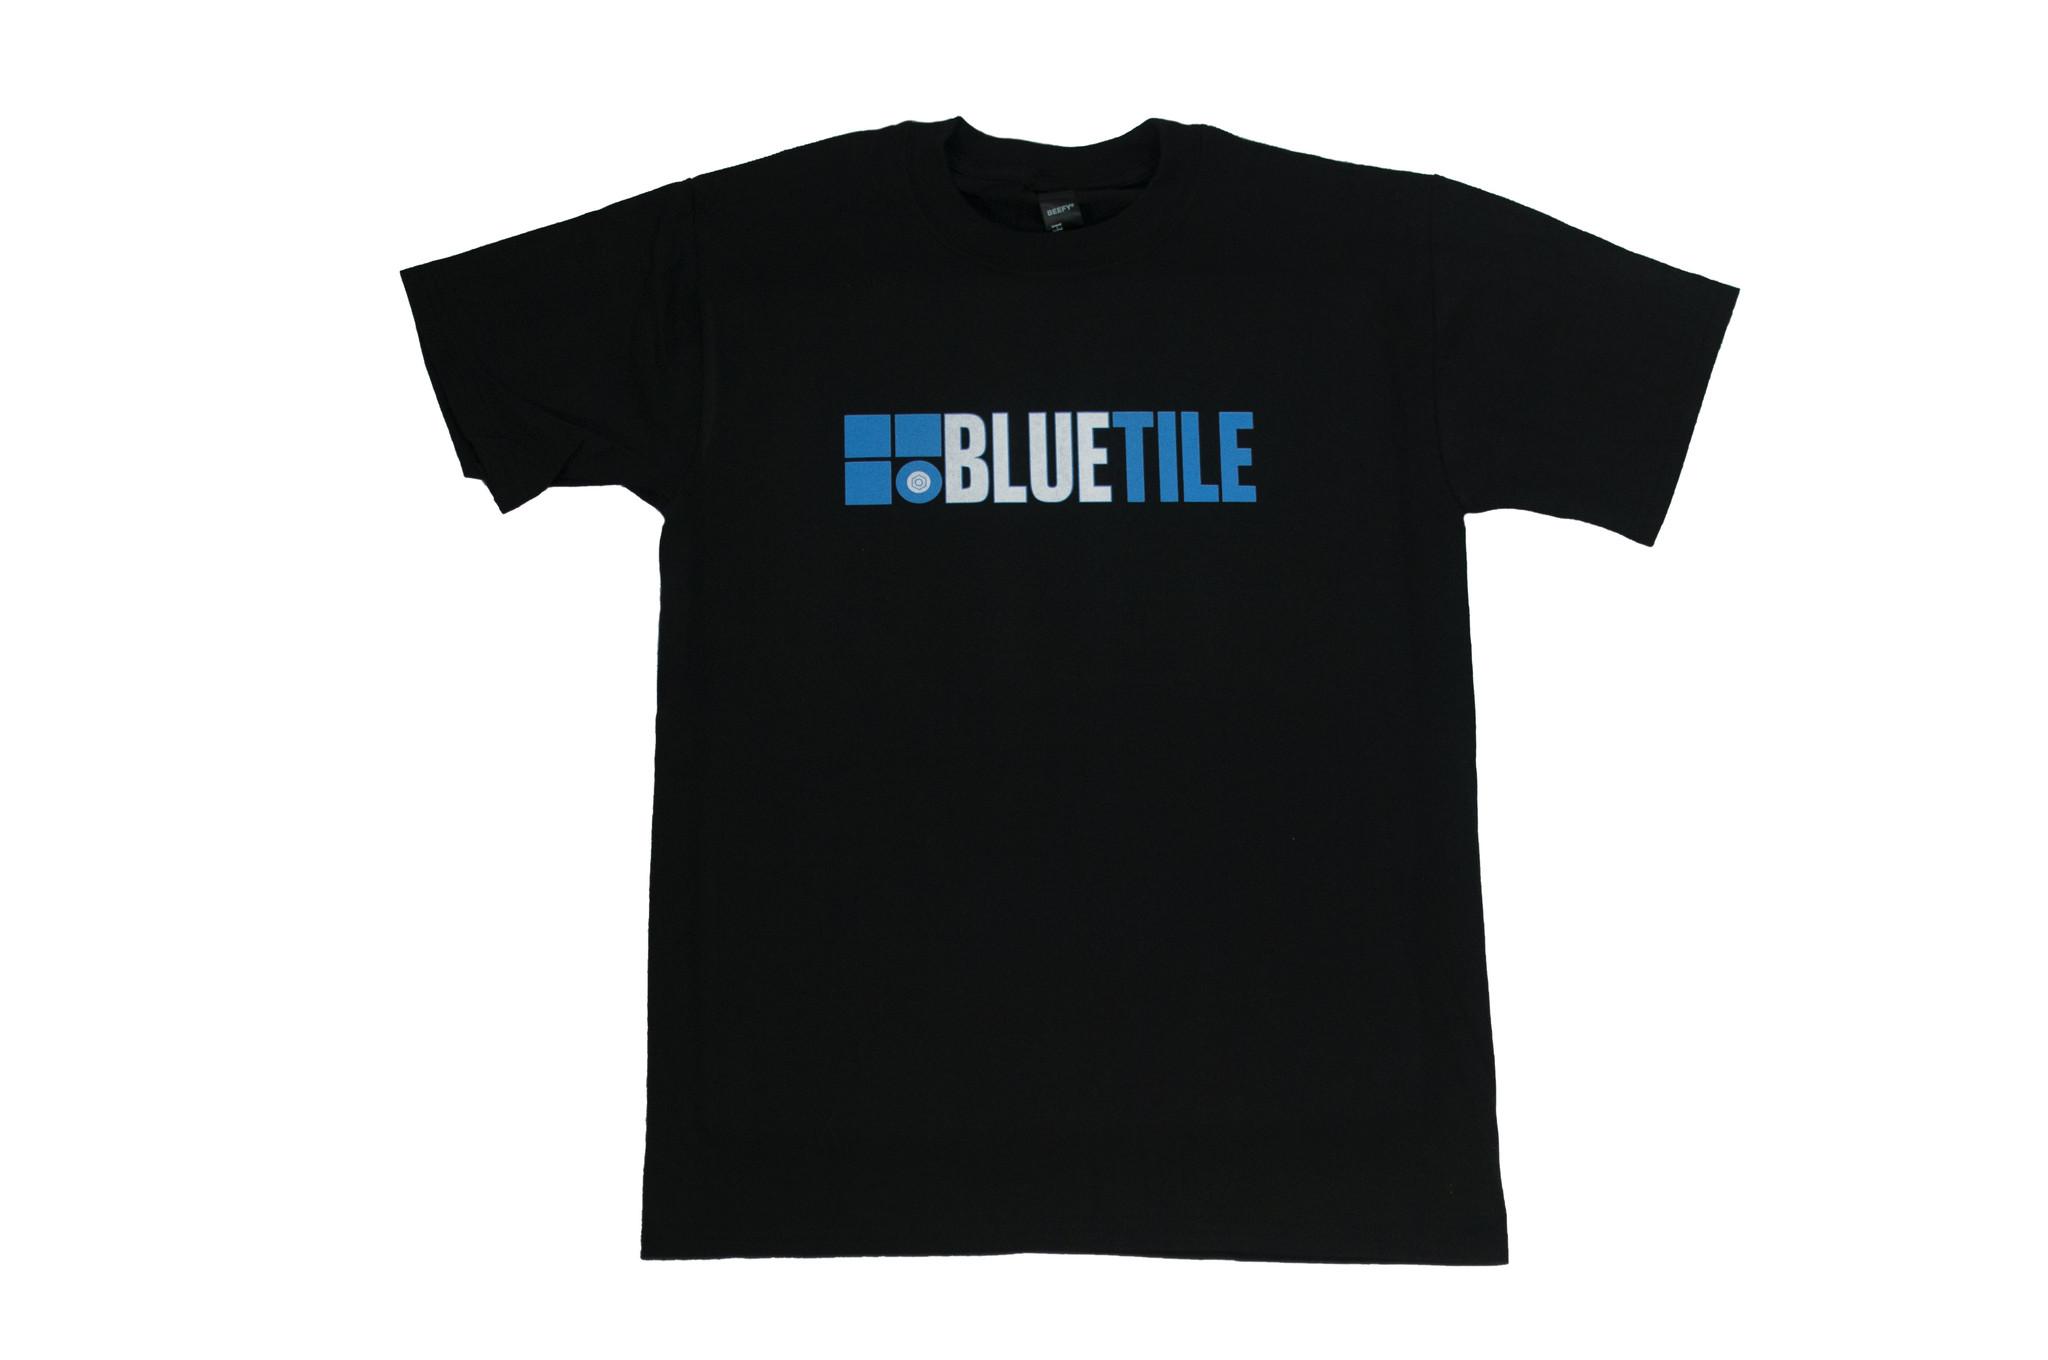 BLUETILE BLUETILE THROWBACK 2010 LOGO T-SHIRT BLACK